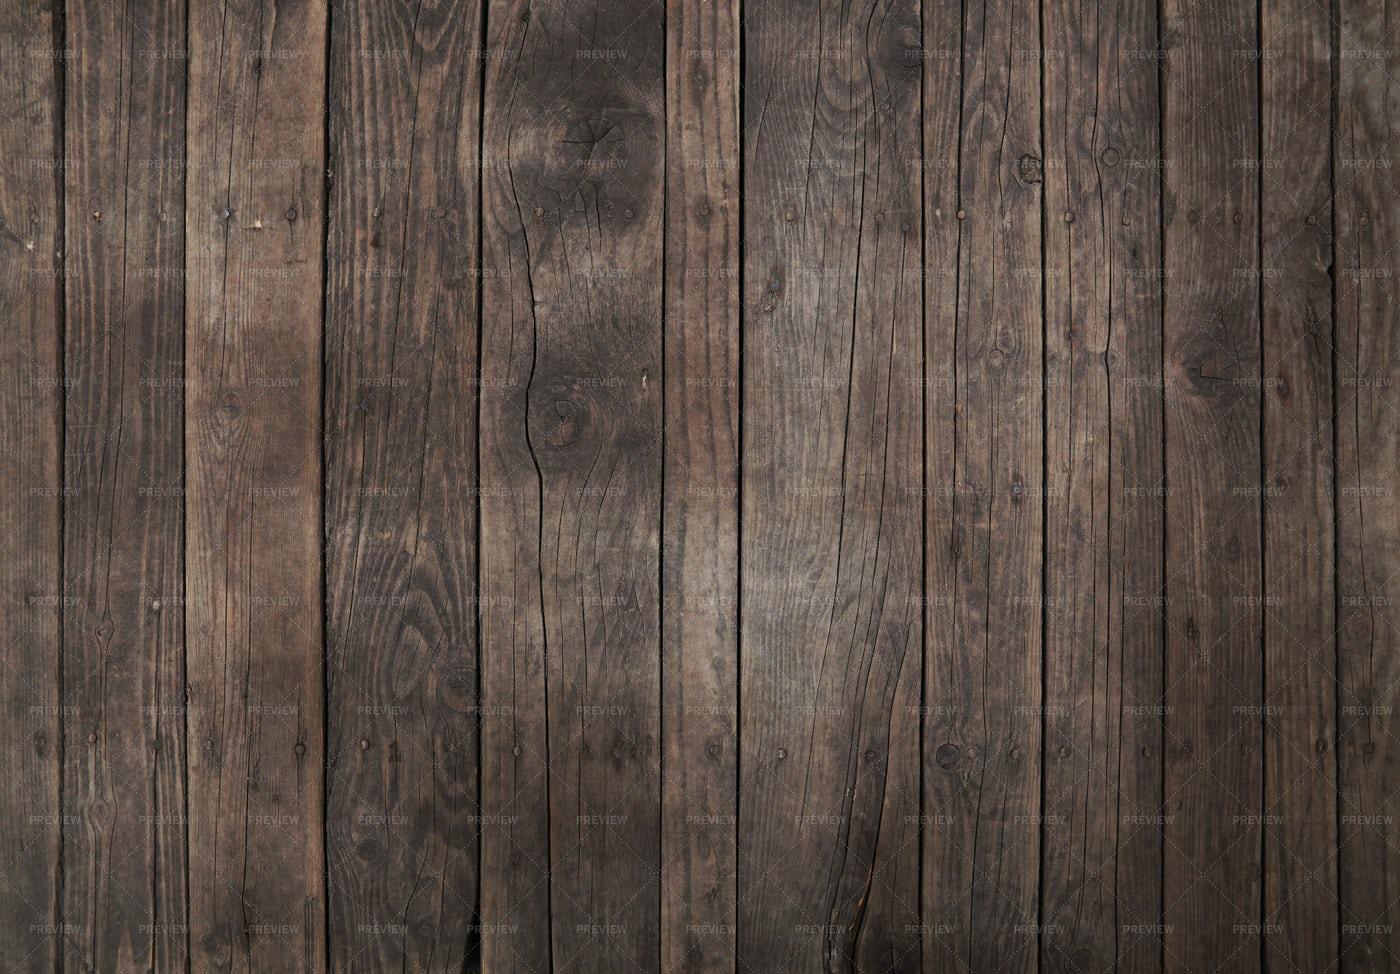 Dark Brown Wooden Planks: Stock Photos